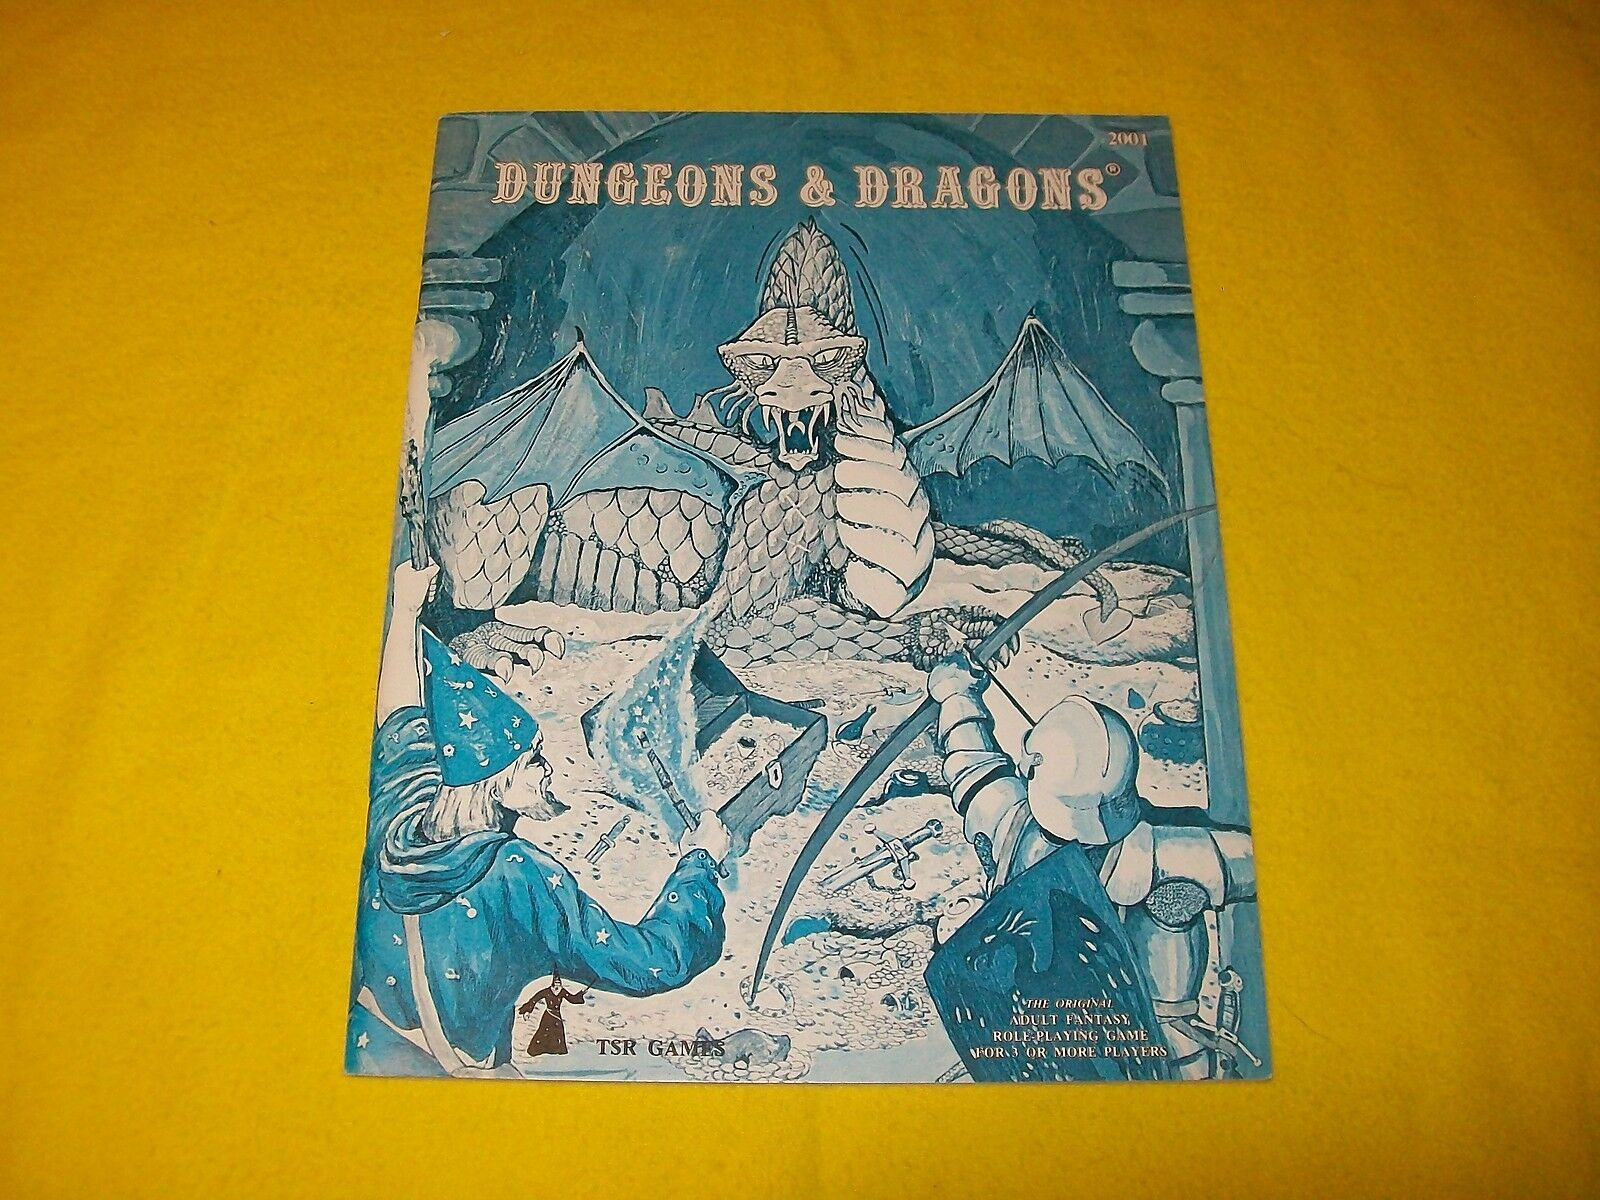 DUNGEONS & DRAGONS BASIC BOOK HOLMES Blau BOOK - 3  WIZARD LOGO